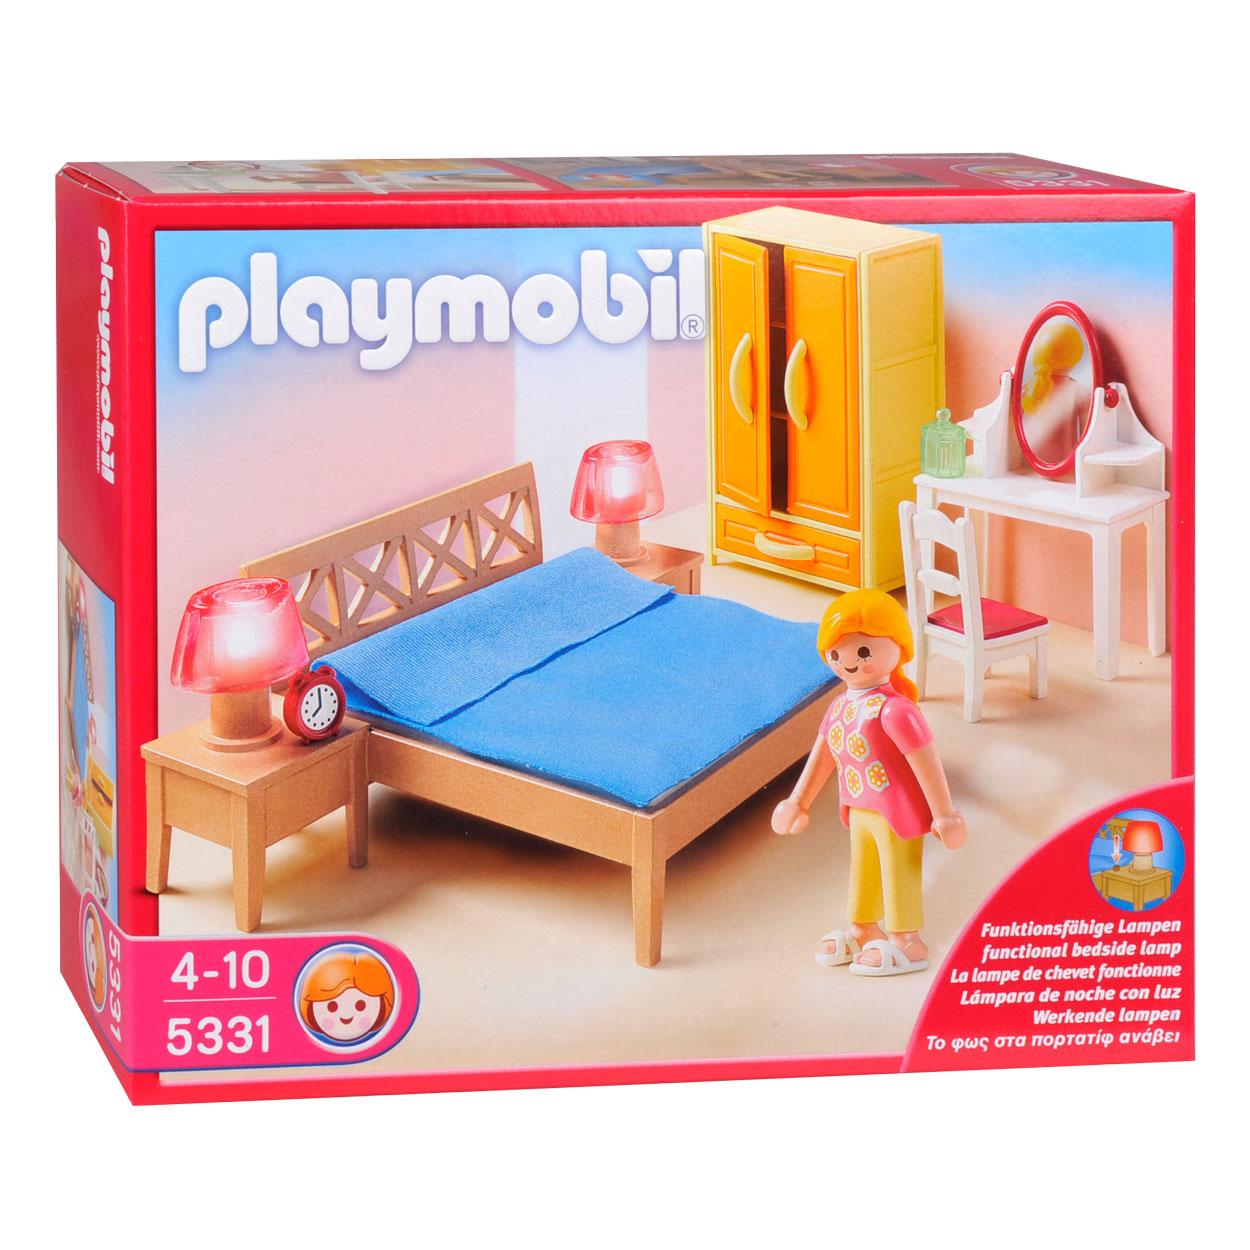 Playmobil Slaapkamer Van De Ouders 5331.Playmobil 5331 Slaapkamer Van De Ouders Online Kopen Lobbes Speelgoed